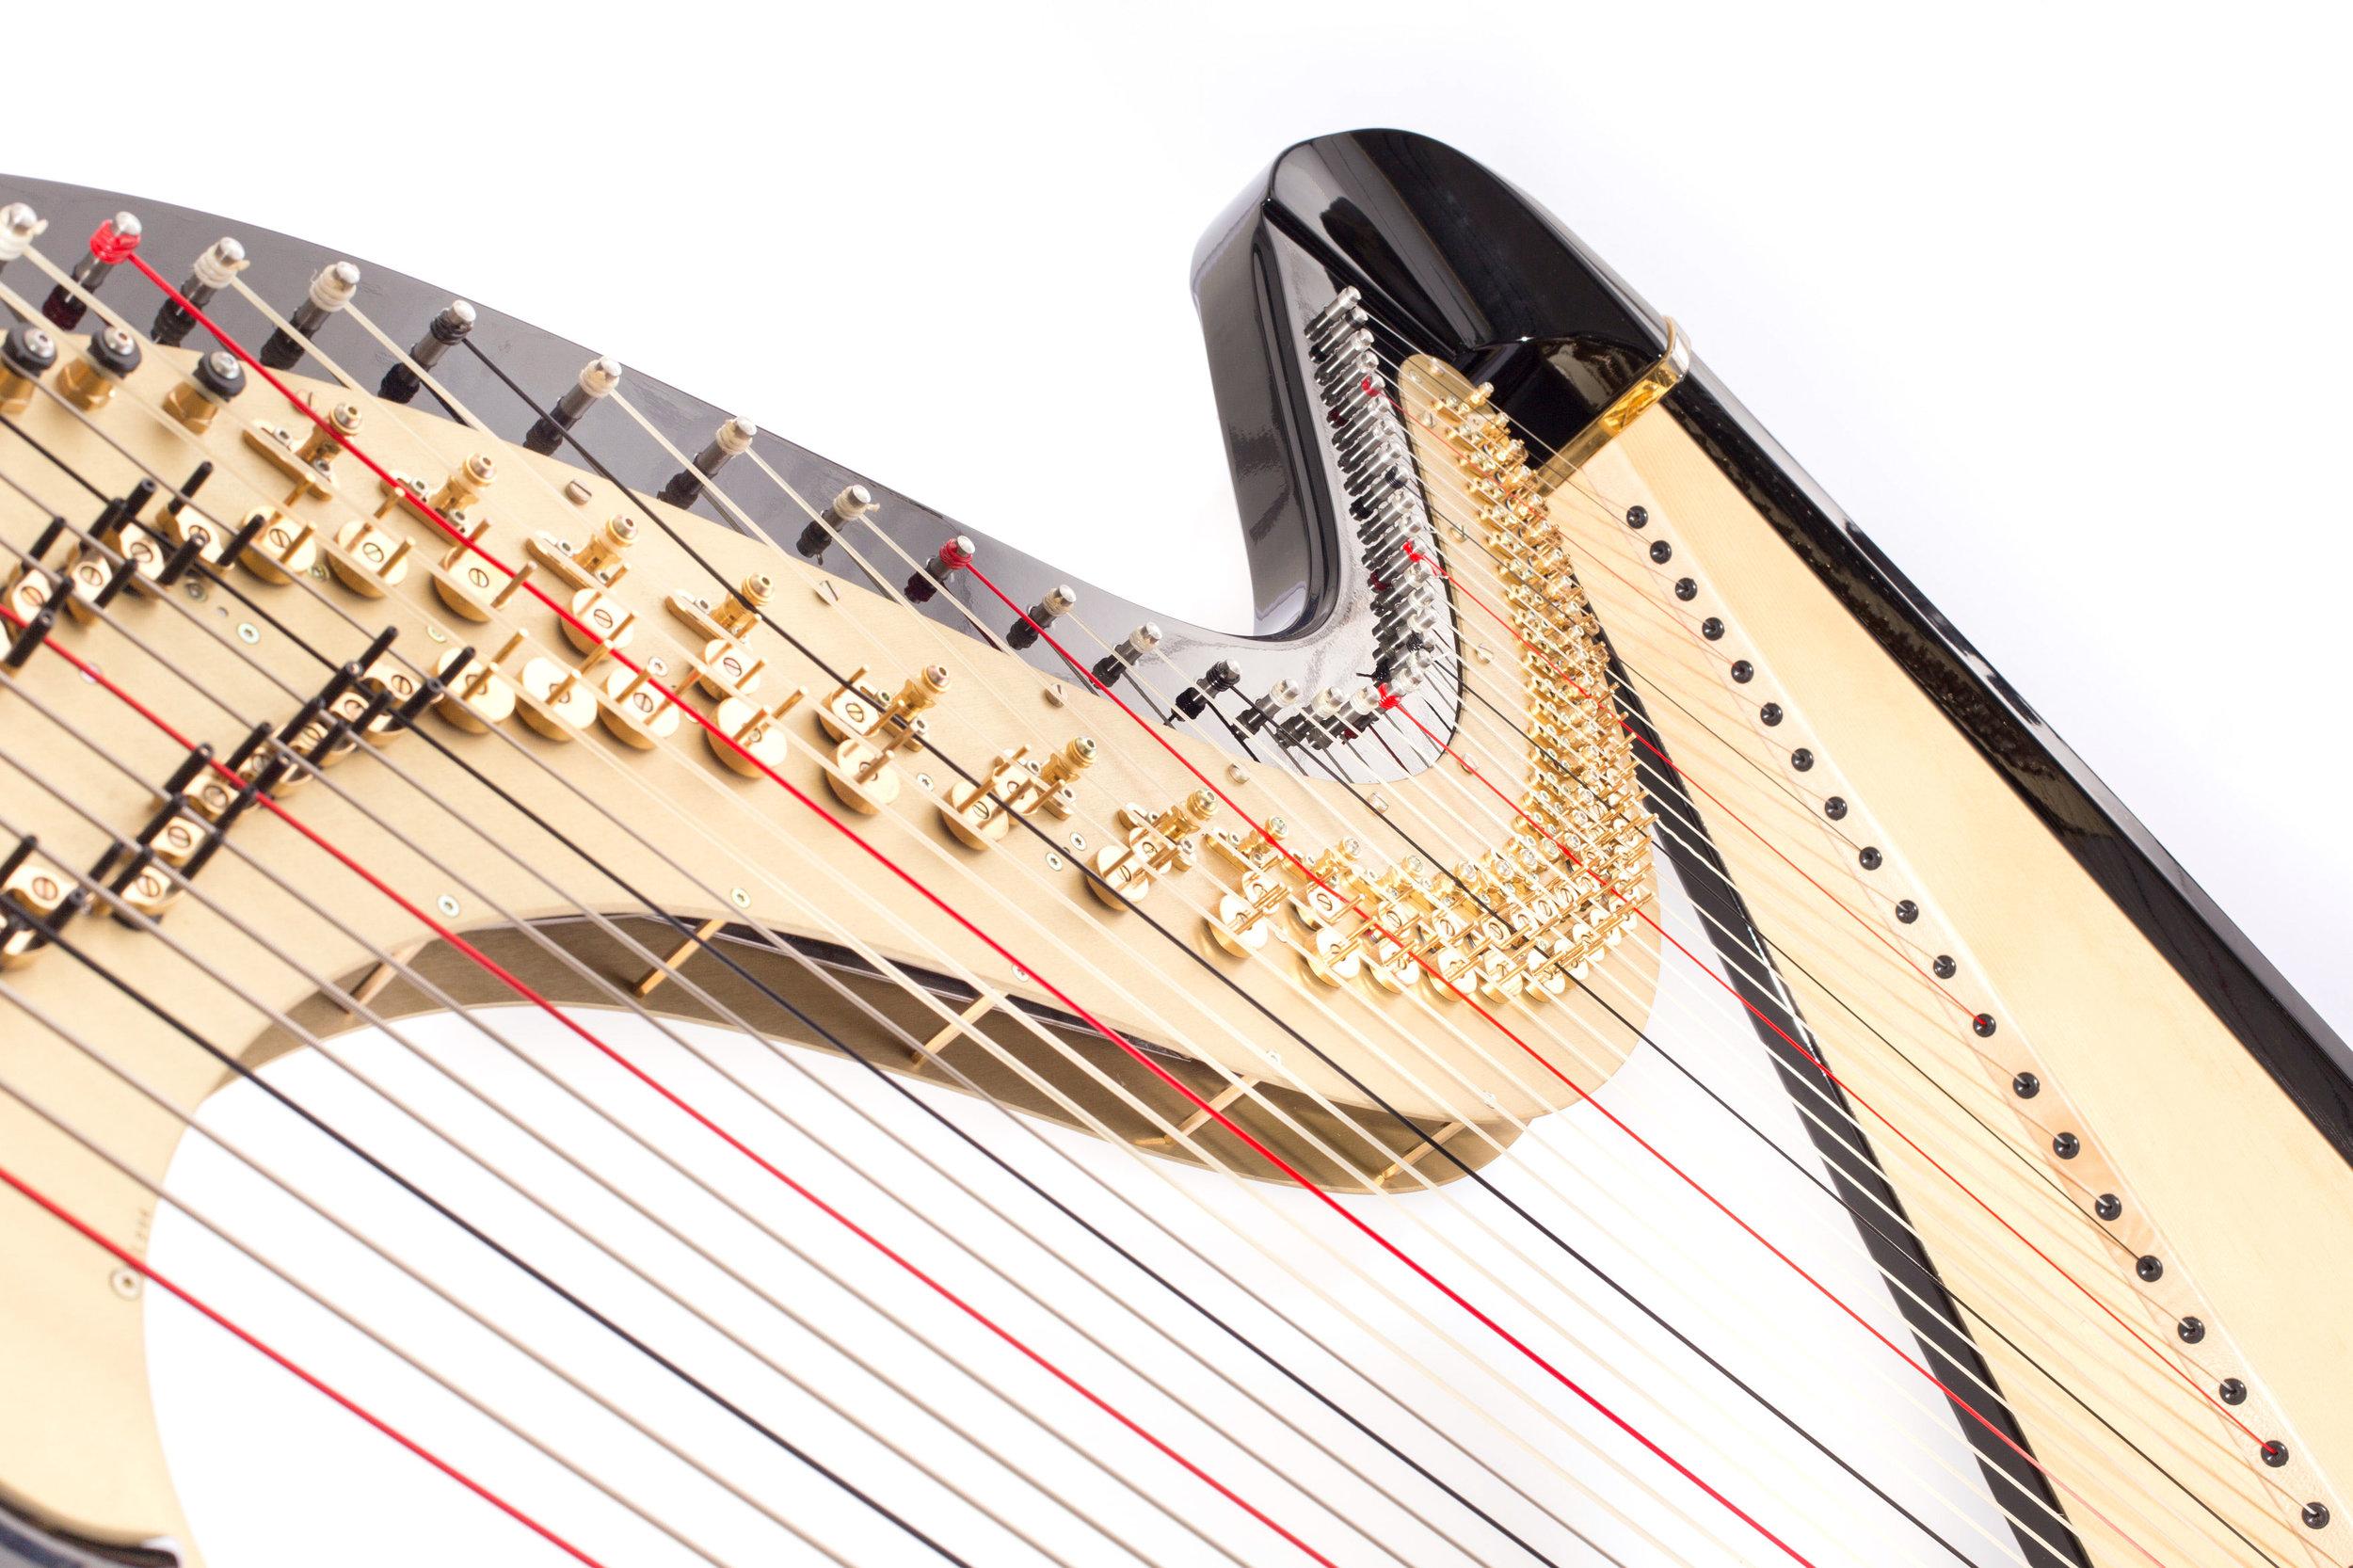 2017_08_21_Seána-Davey_Harpist-047.jpg